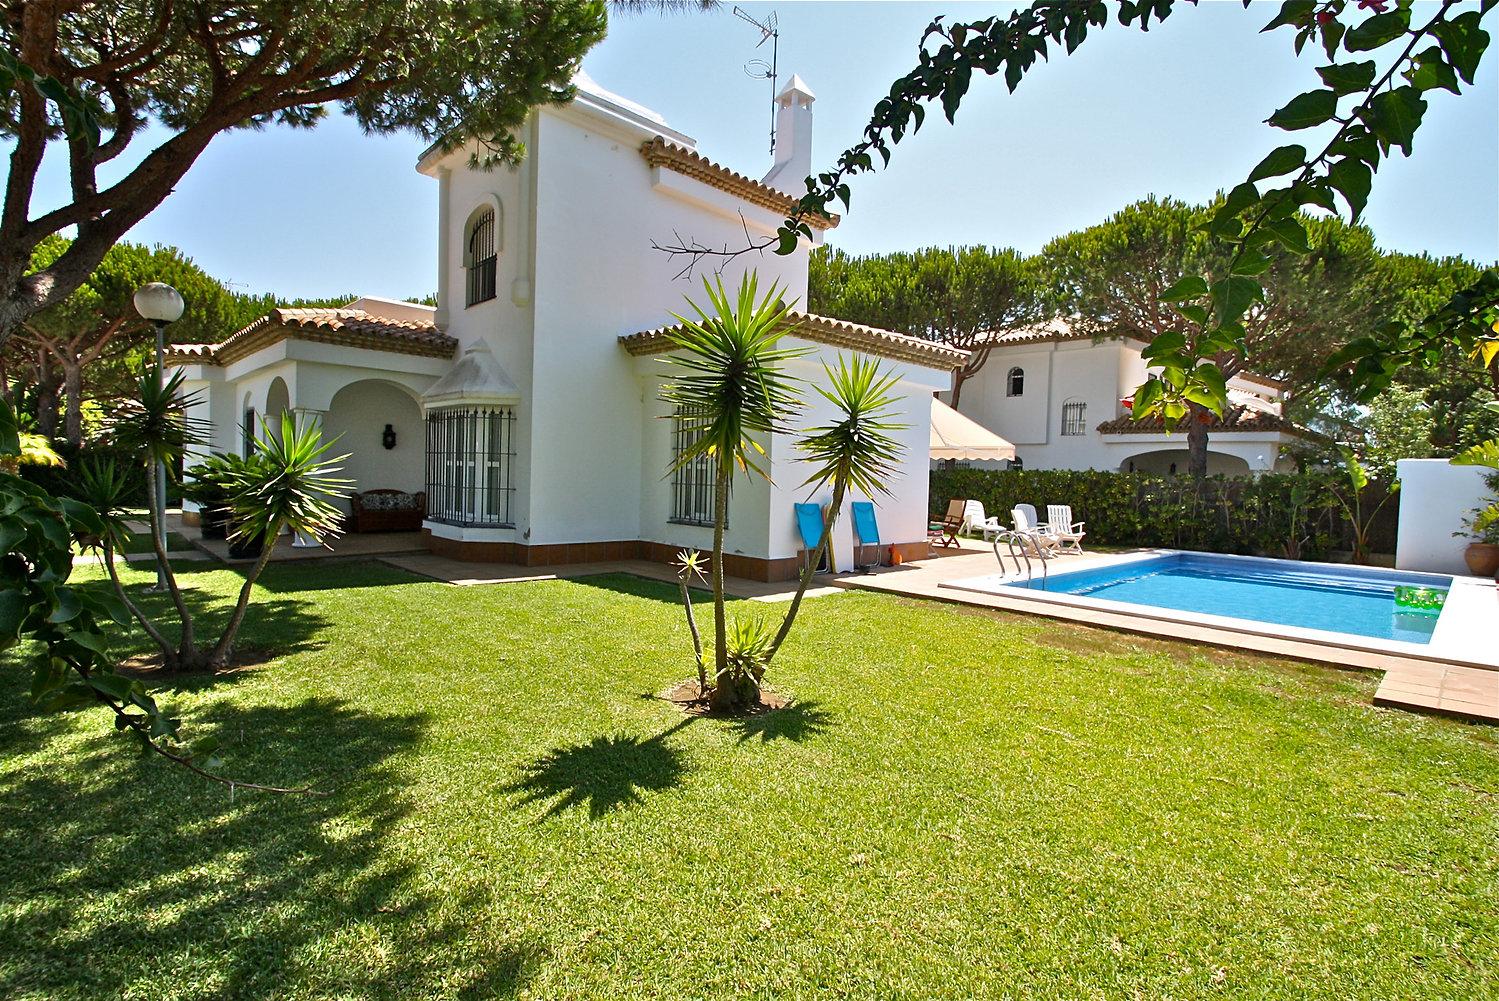 garden-holiday-home-pool-refv74.JPG